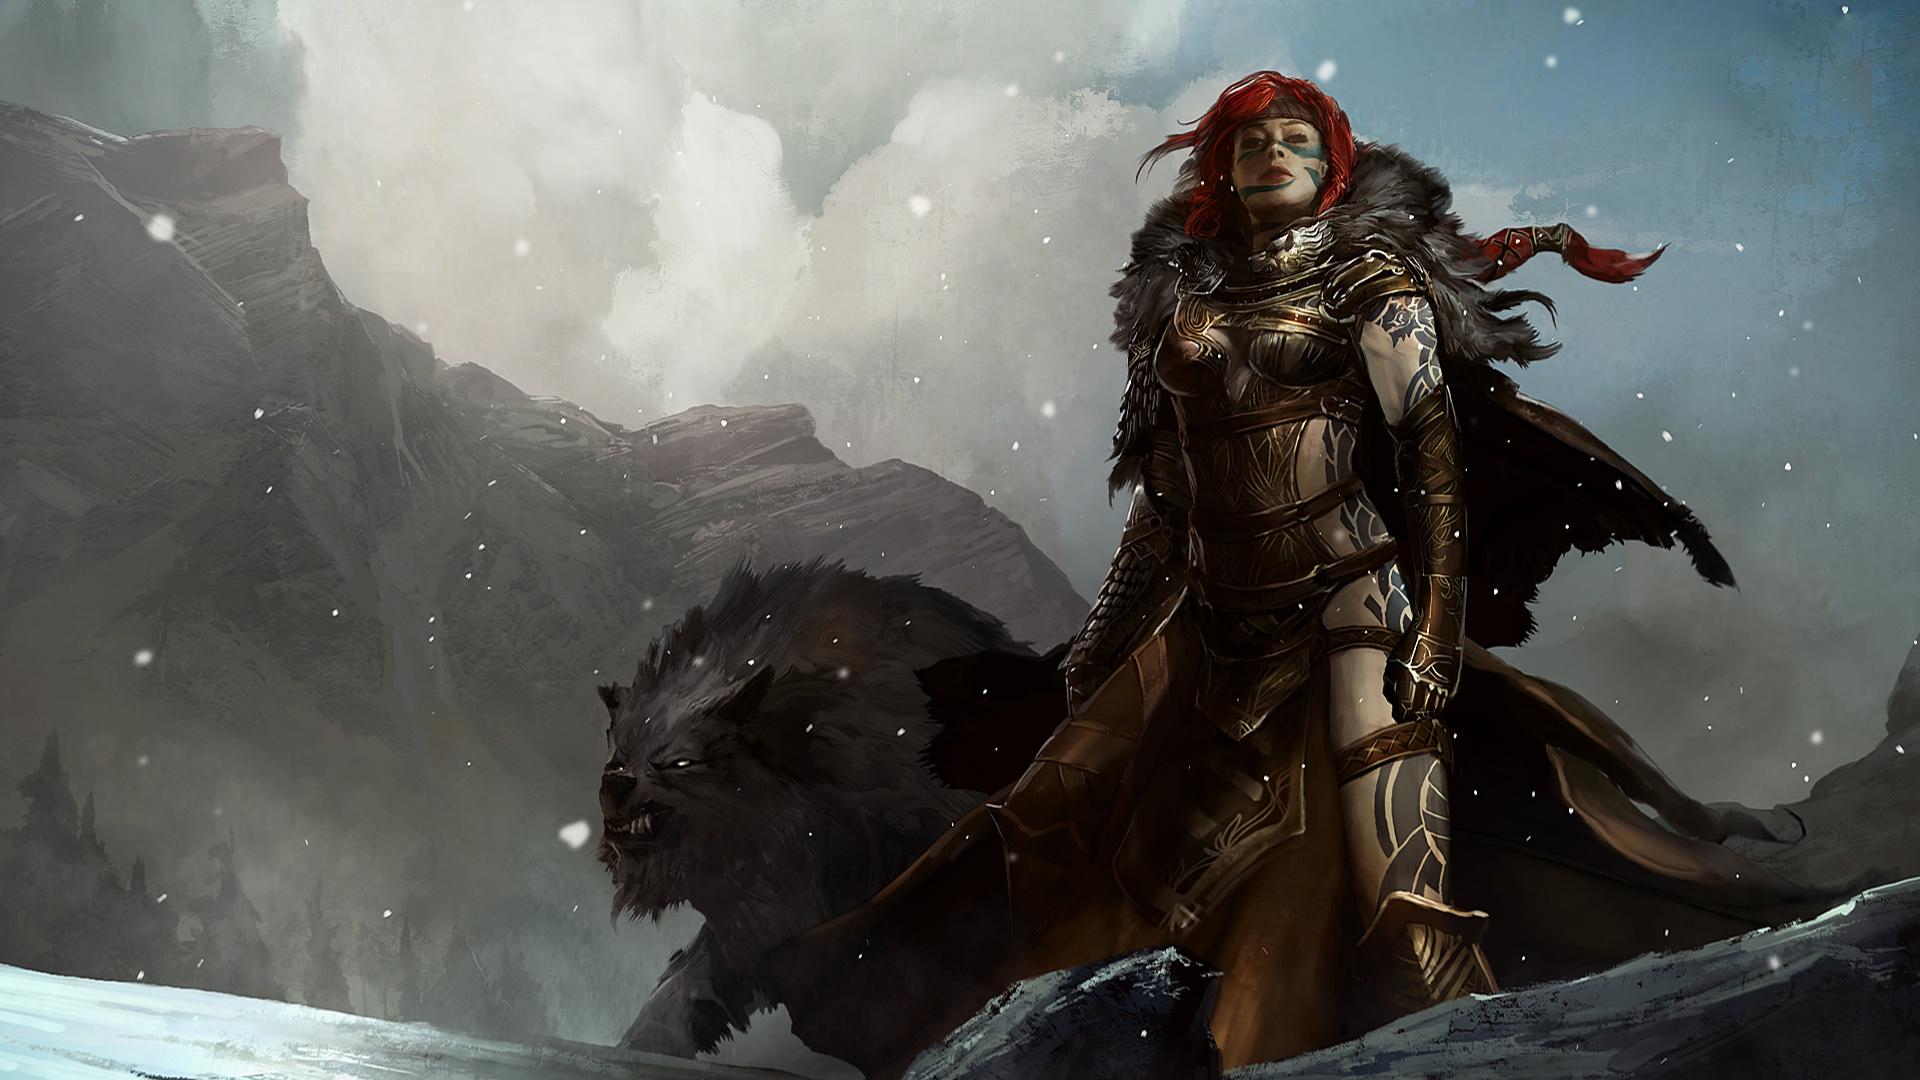 Fantasy Warrior Images 9 Thumb